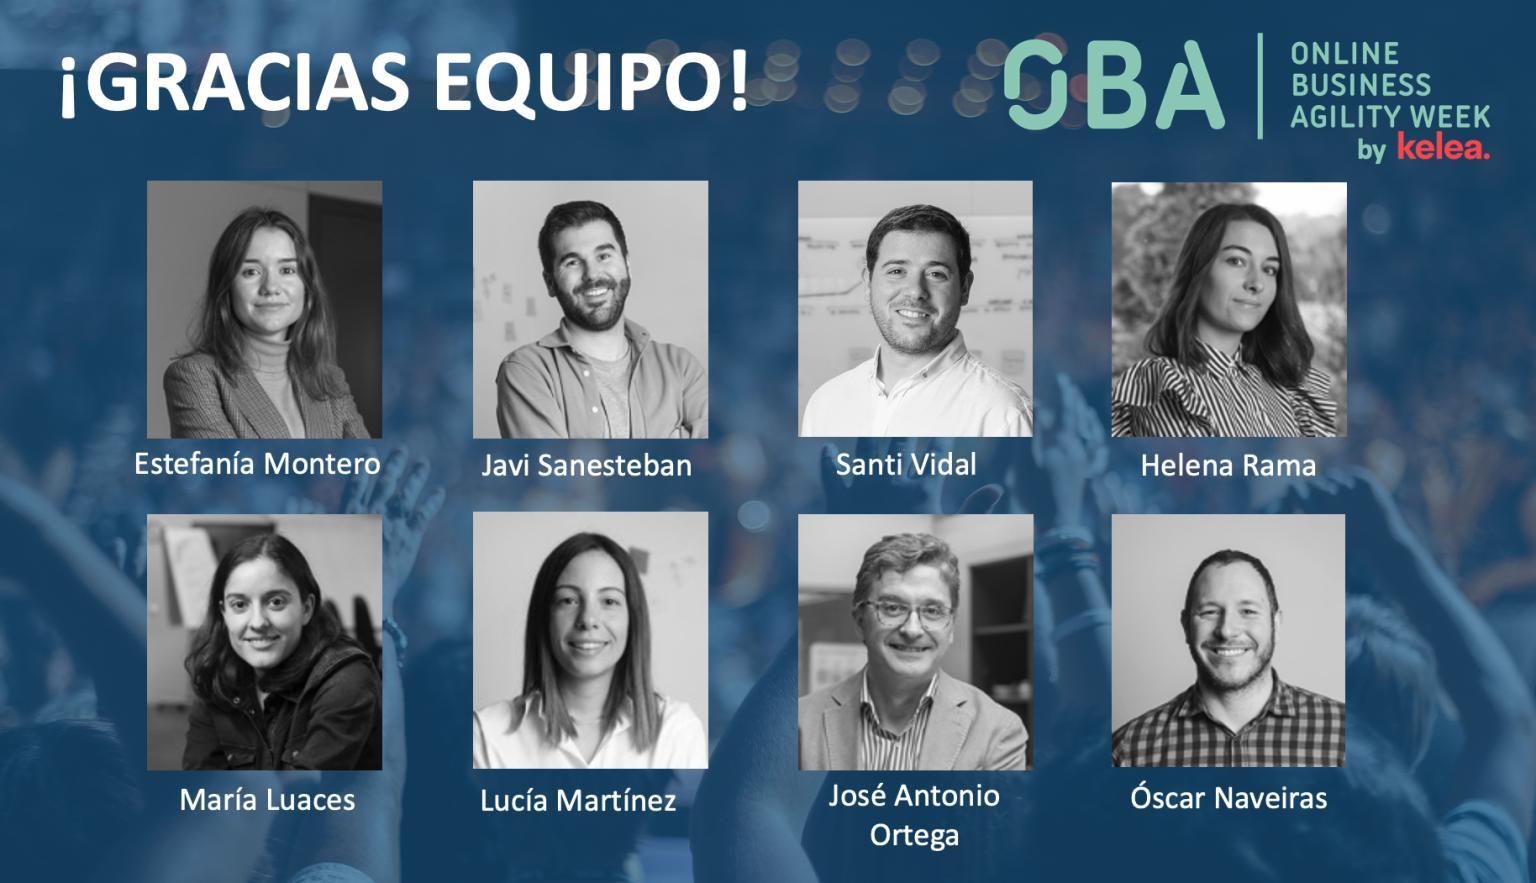 Equipo OBA Week